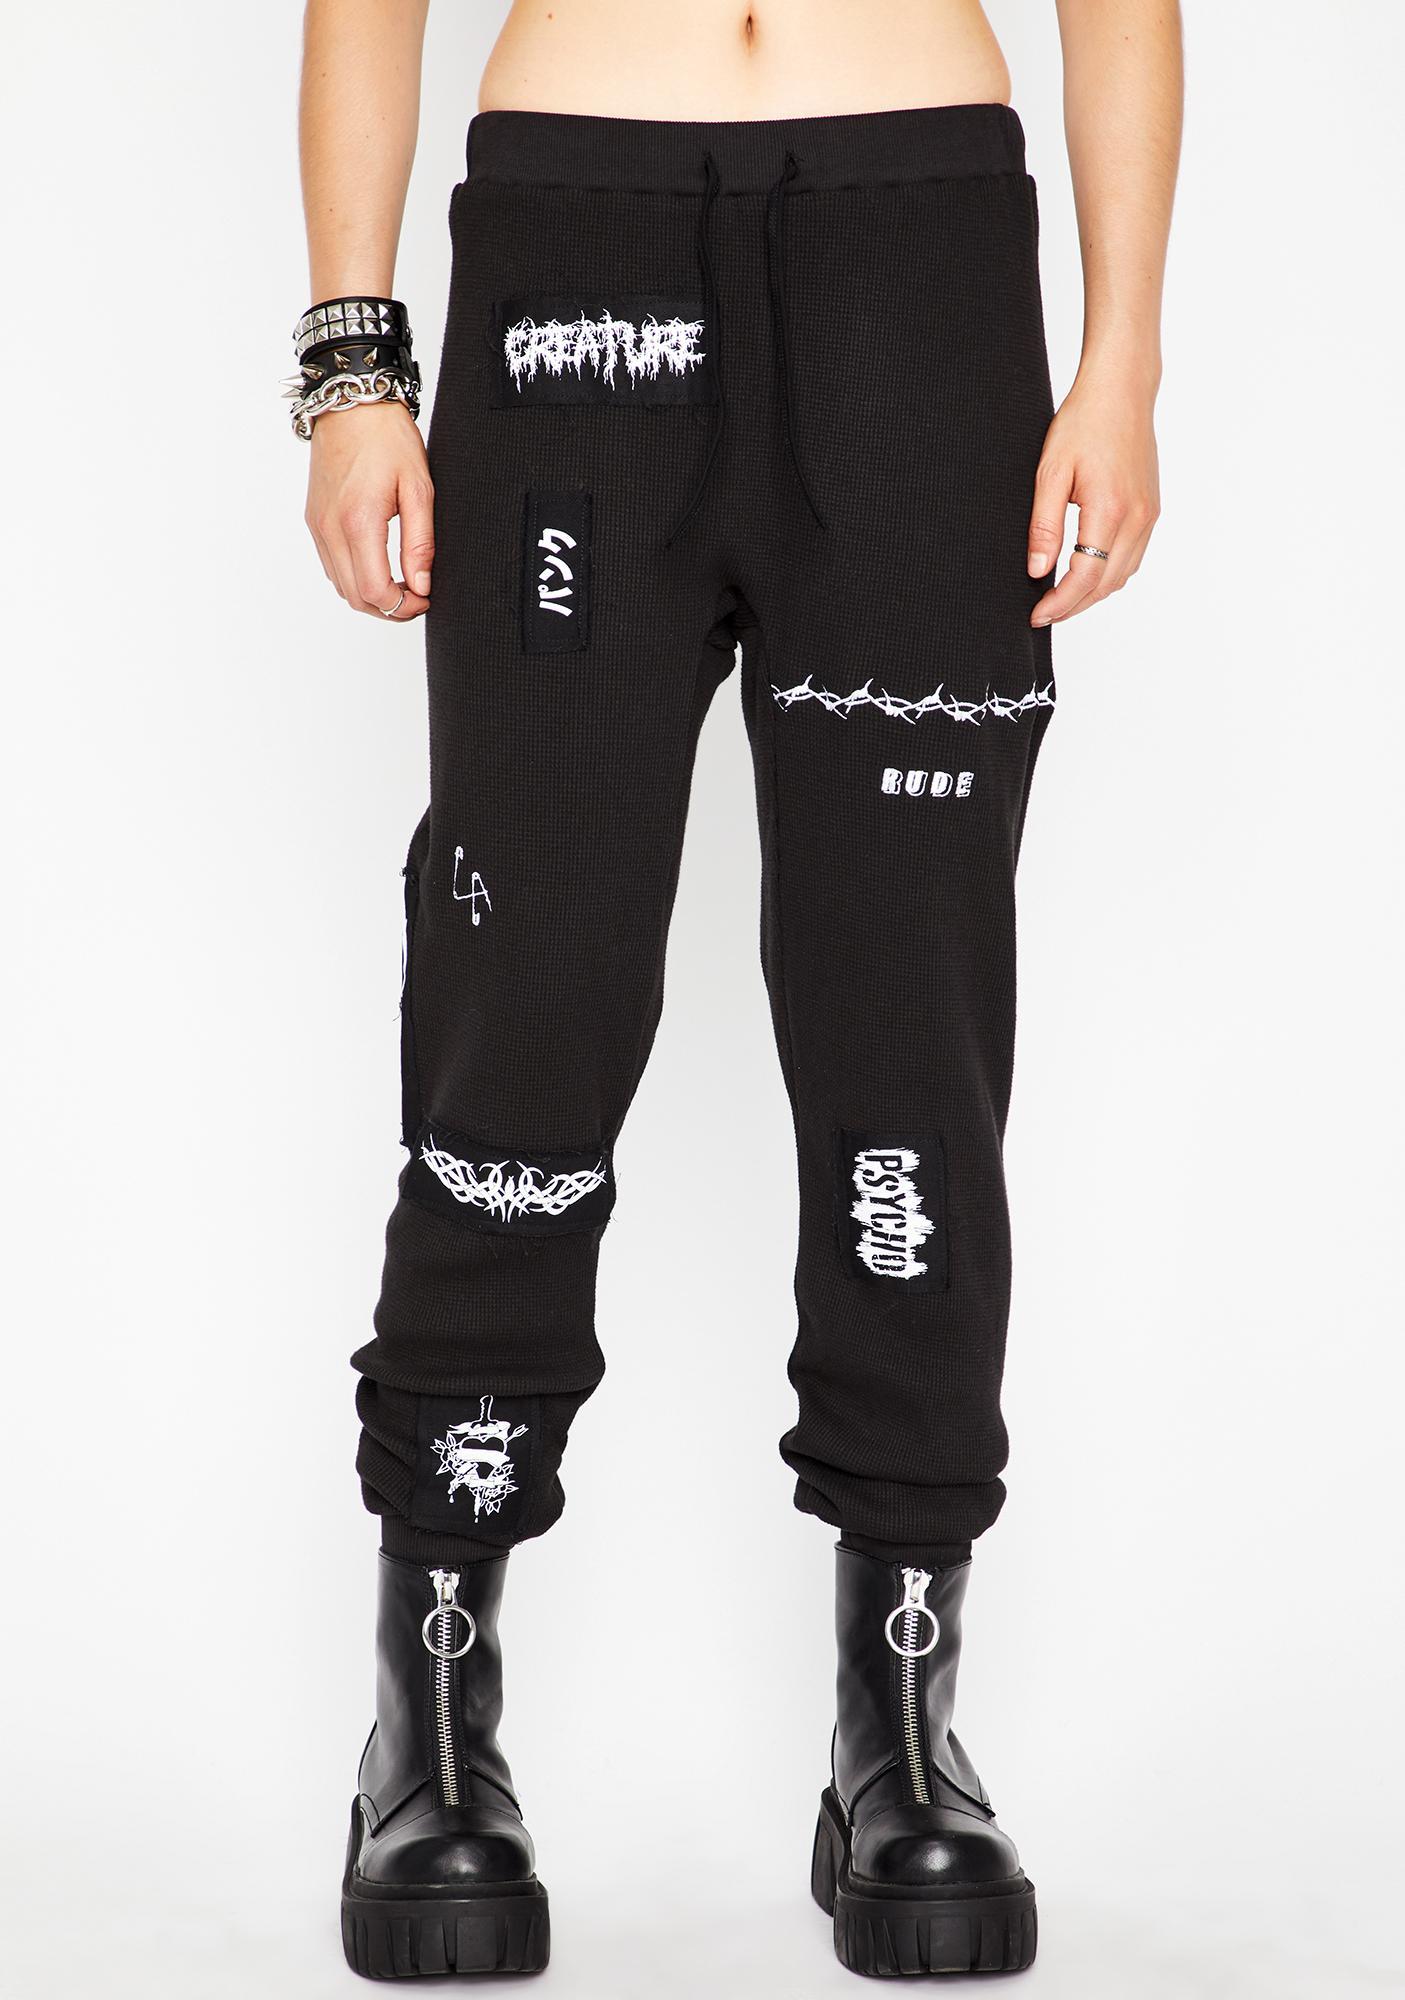 Current Mood Generation Psycho Patched Sweatpants